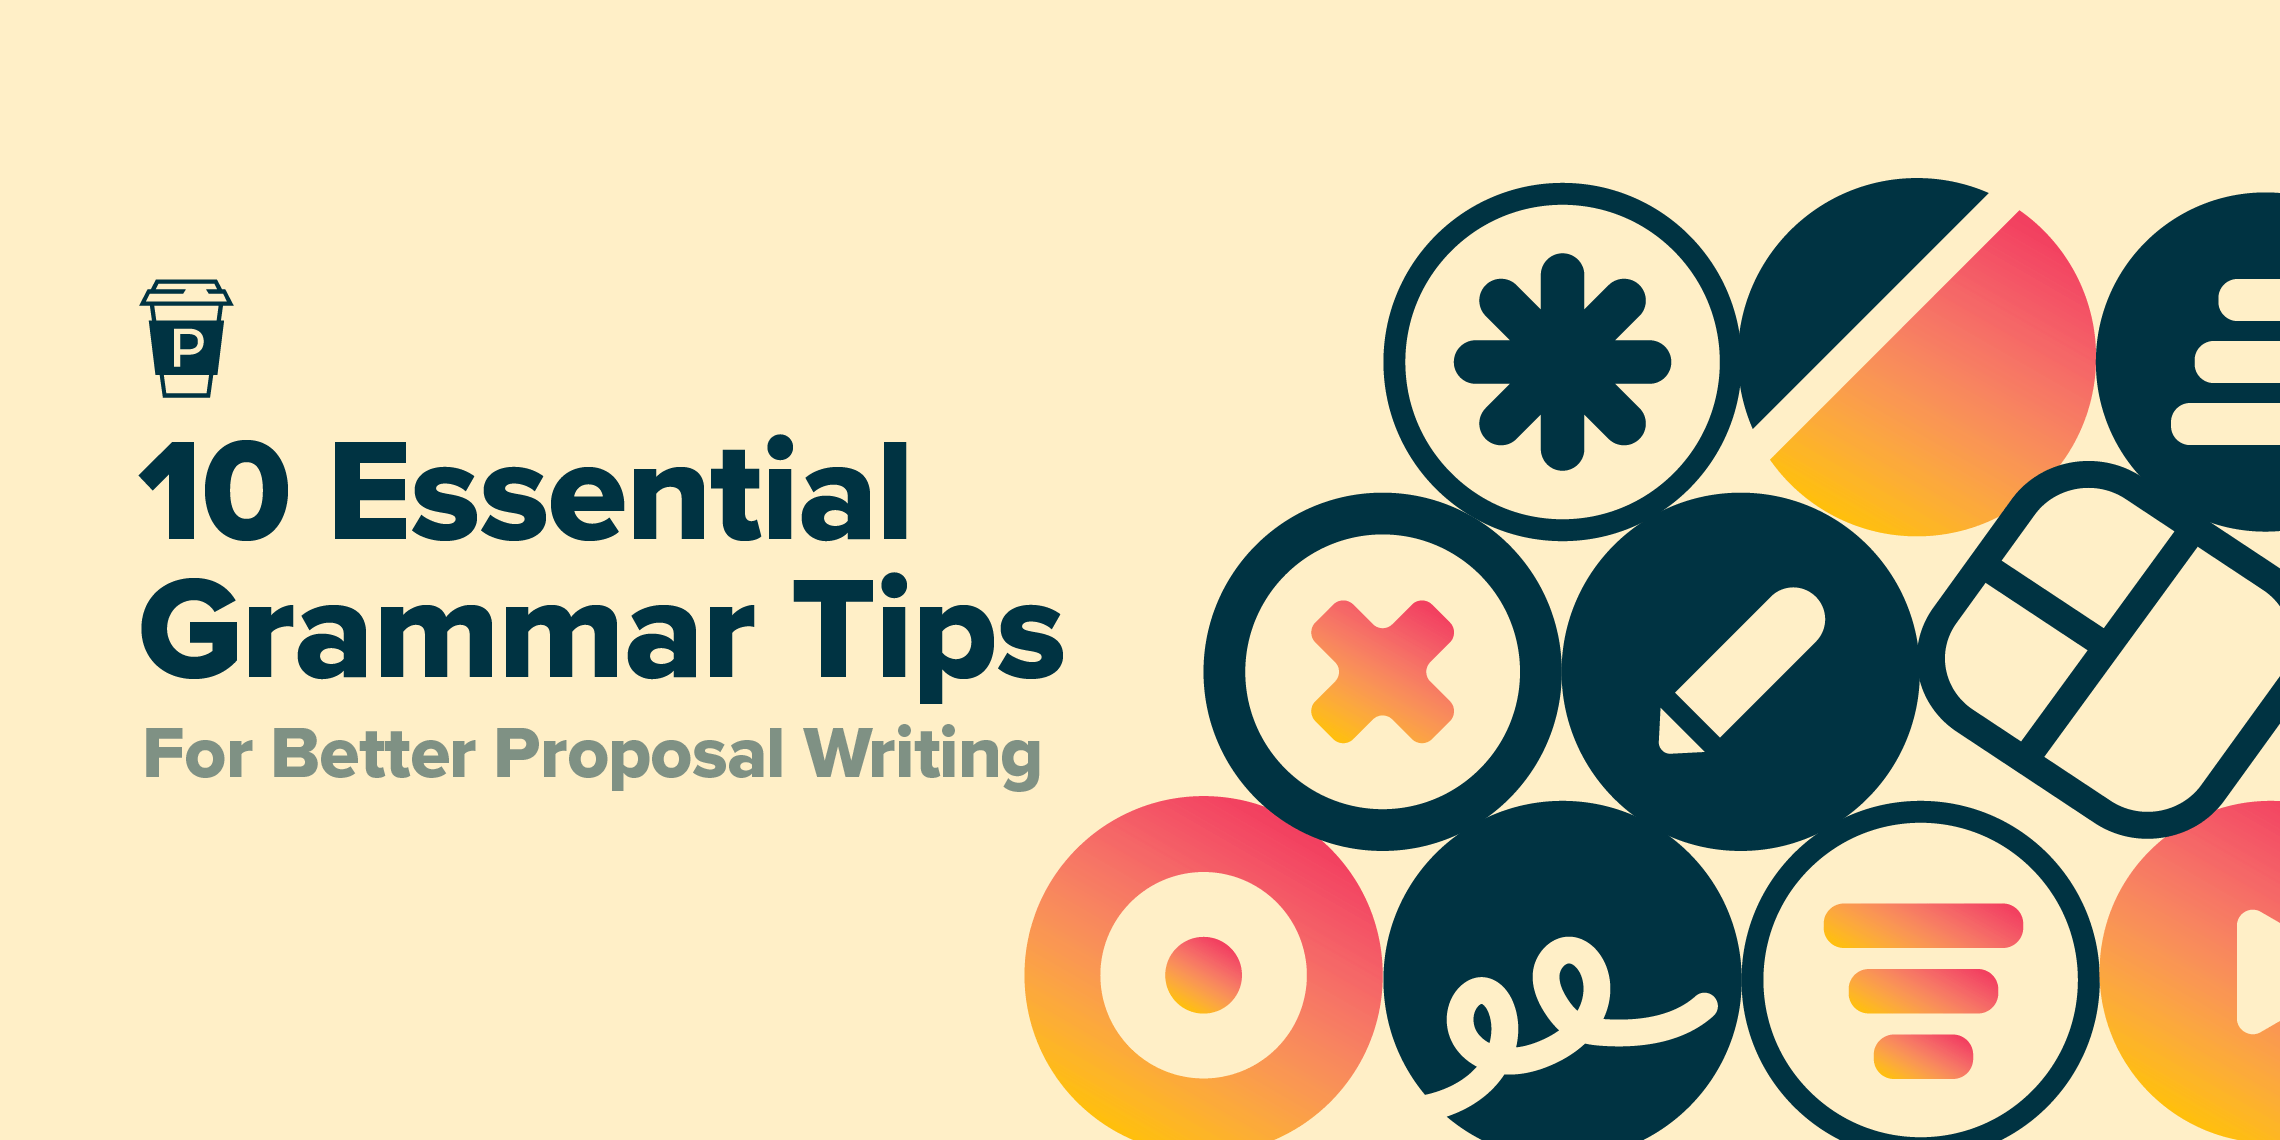 essential grammar tips image